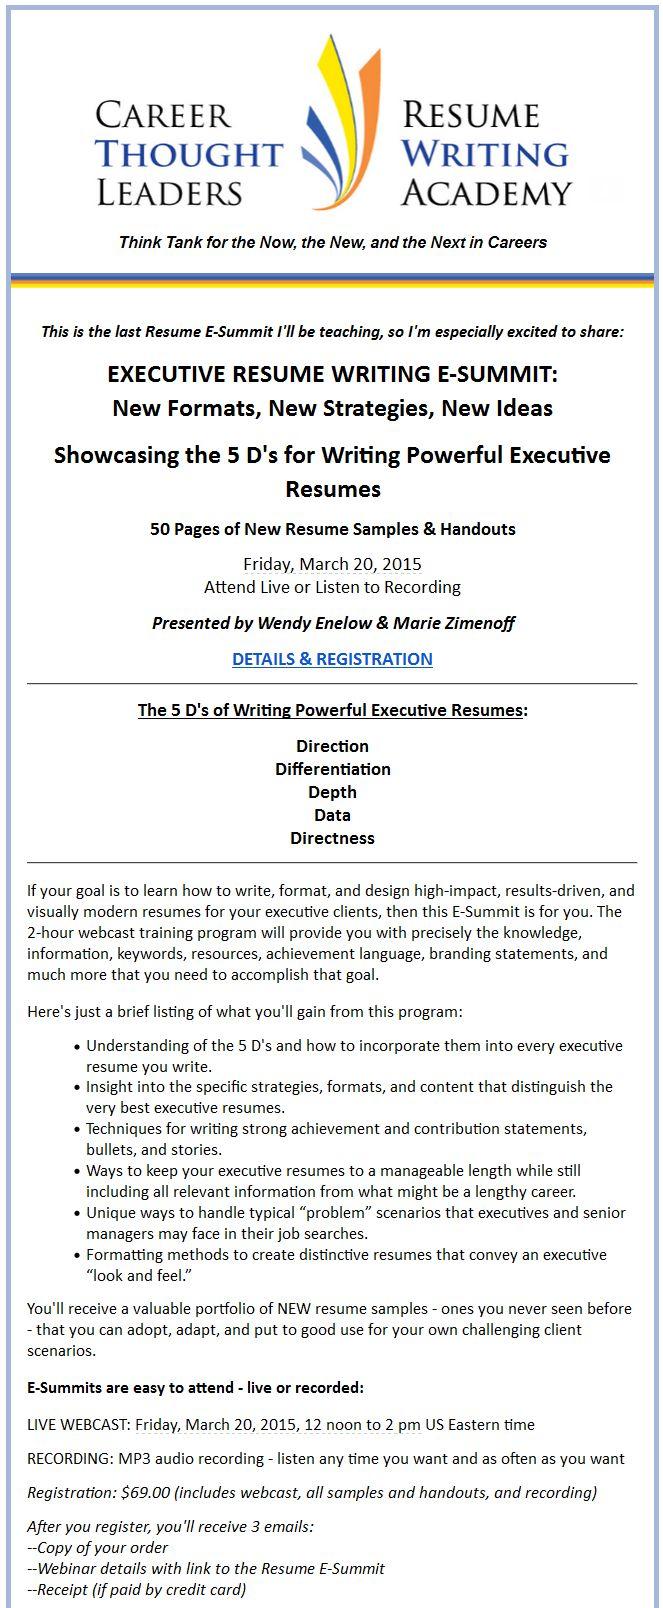 The Resume Writing Academyu0027s Fall ACRW Certification Class Begins September  19th! ➤ Flagship Resume Training U0026 Certification Program Group Class Wu2026  Resume Writing Academy